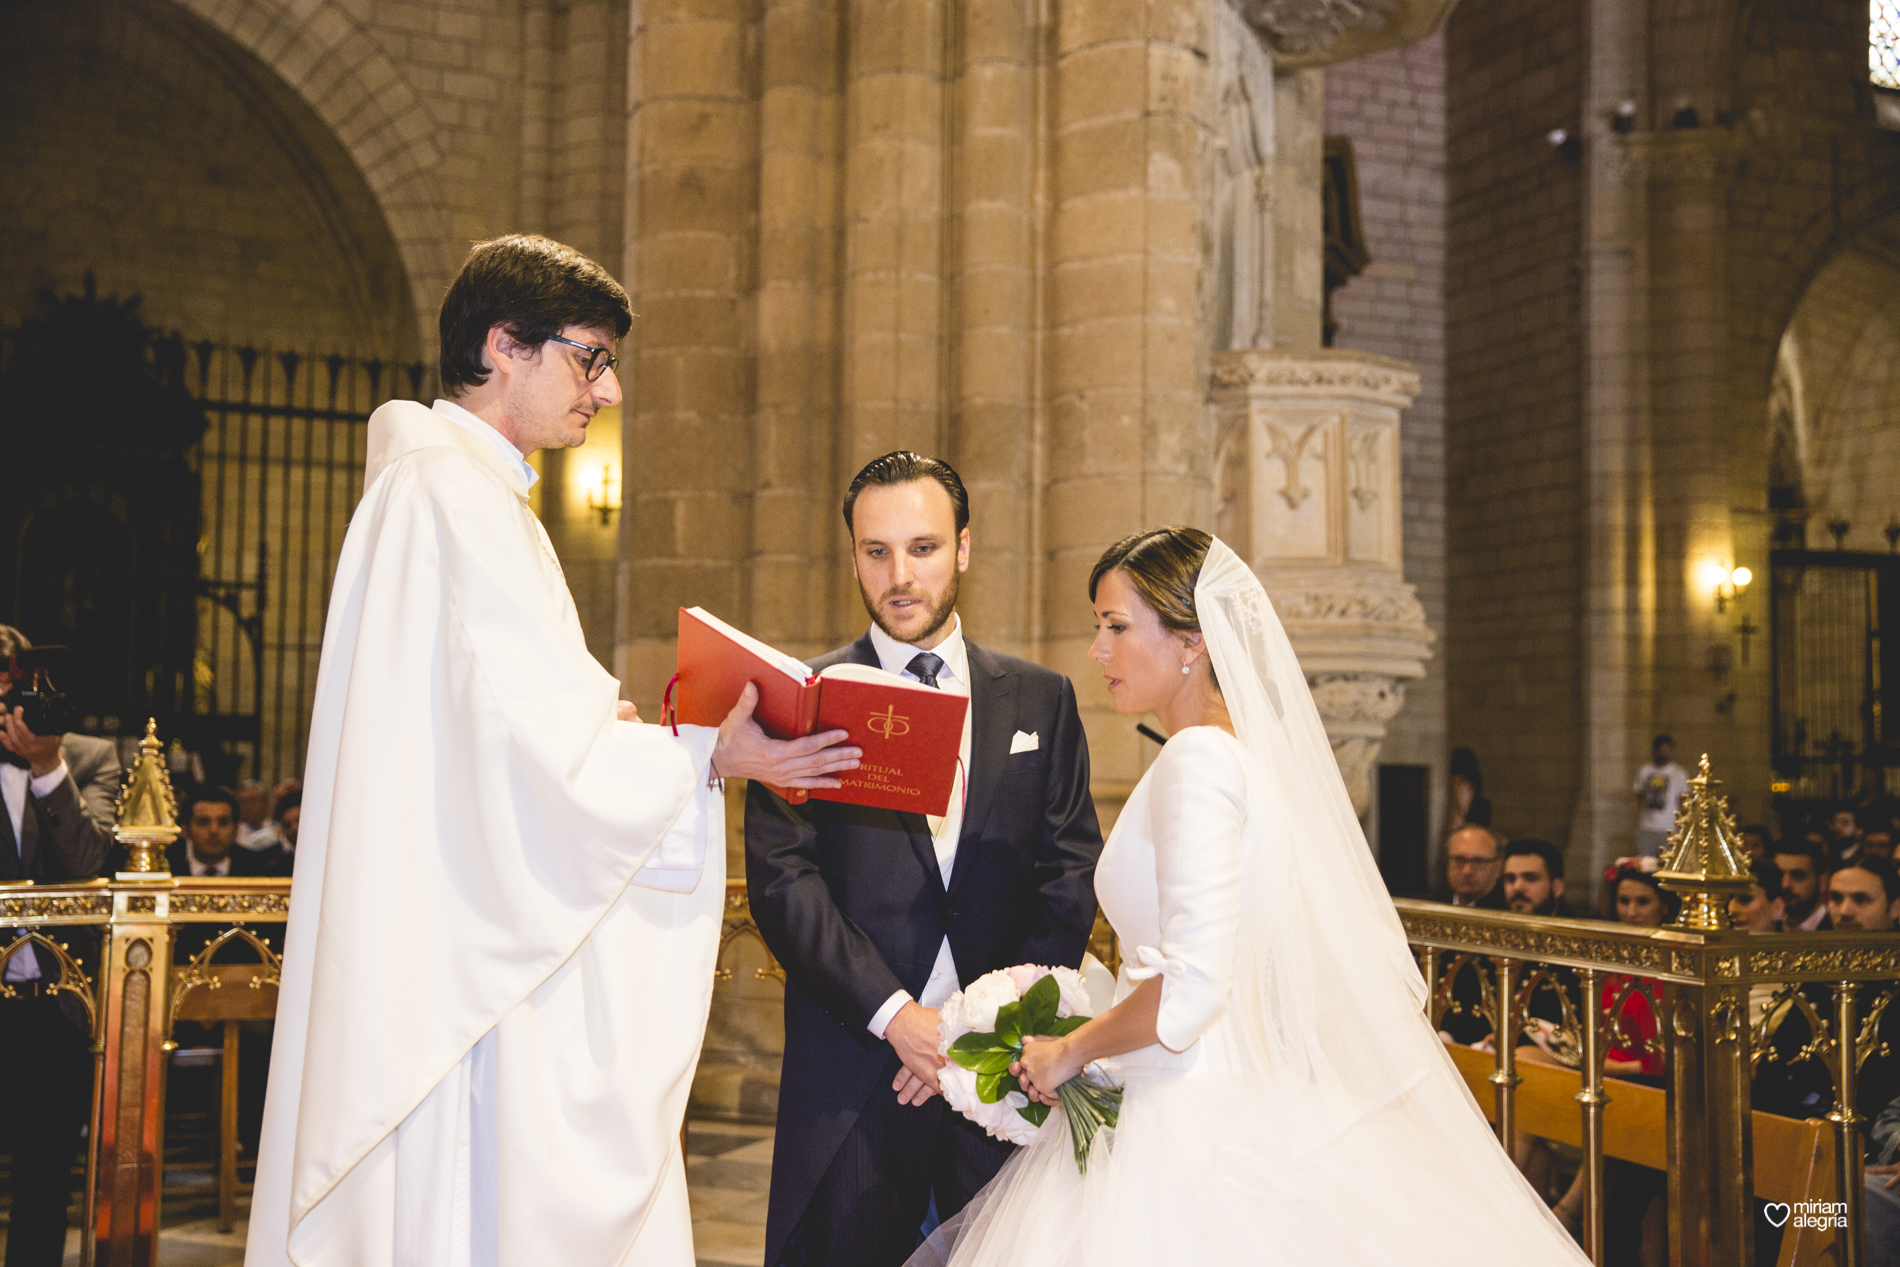 boda-en-la-catedral-de-murcia-miriam-alegria-fotografos-boda-murcia-43